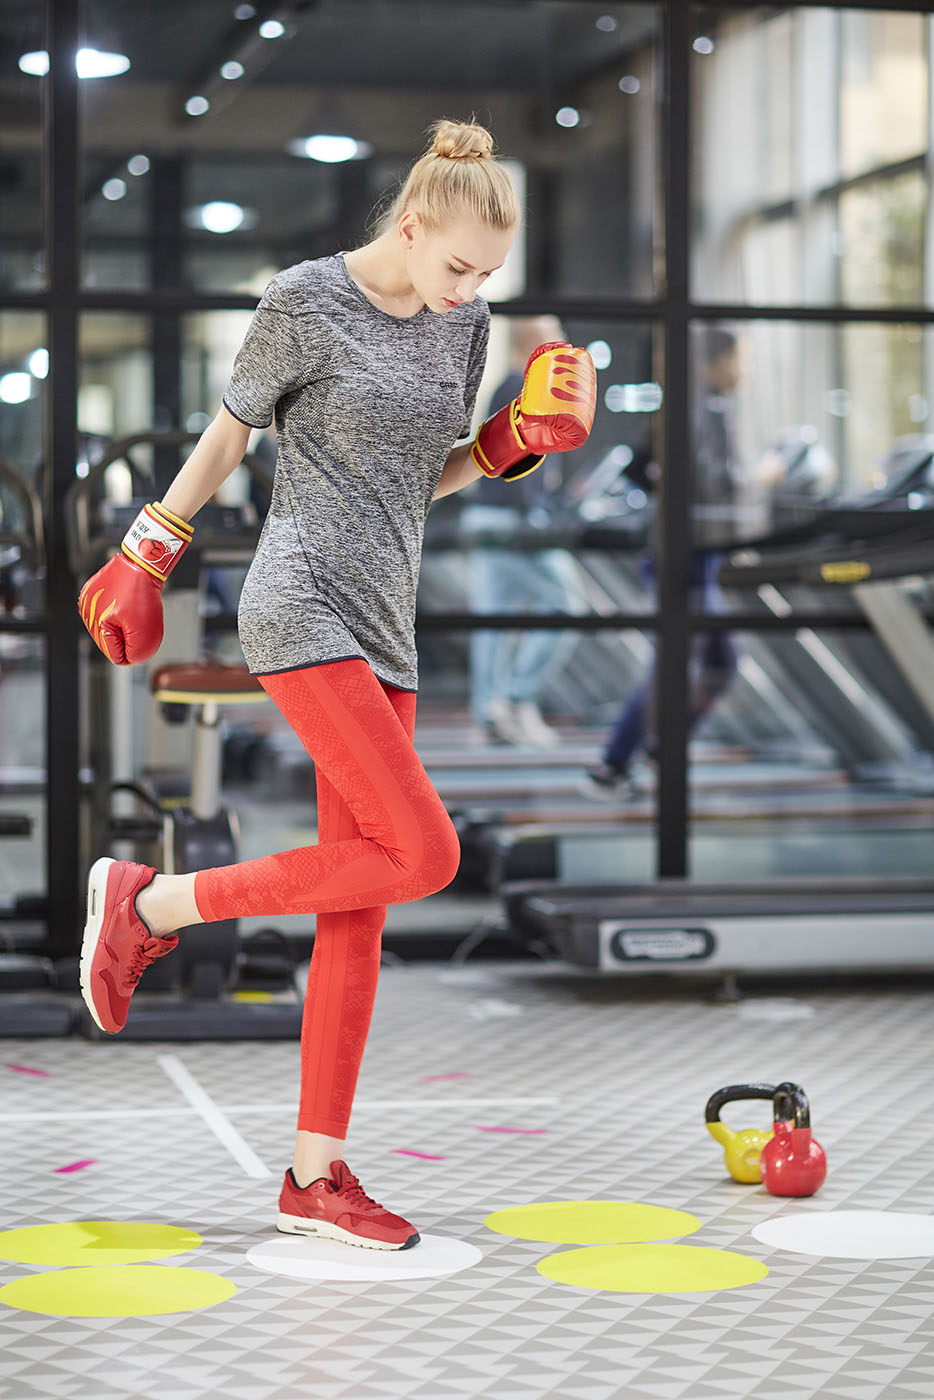 Женщина Fit Спортивная одежда Фитнес-центр Носить футболку, NE298-S-1033